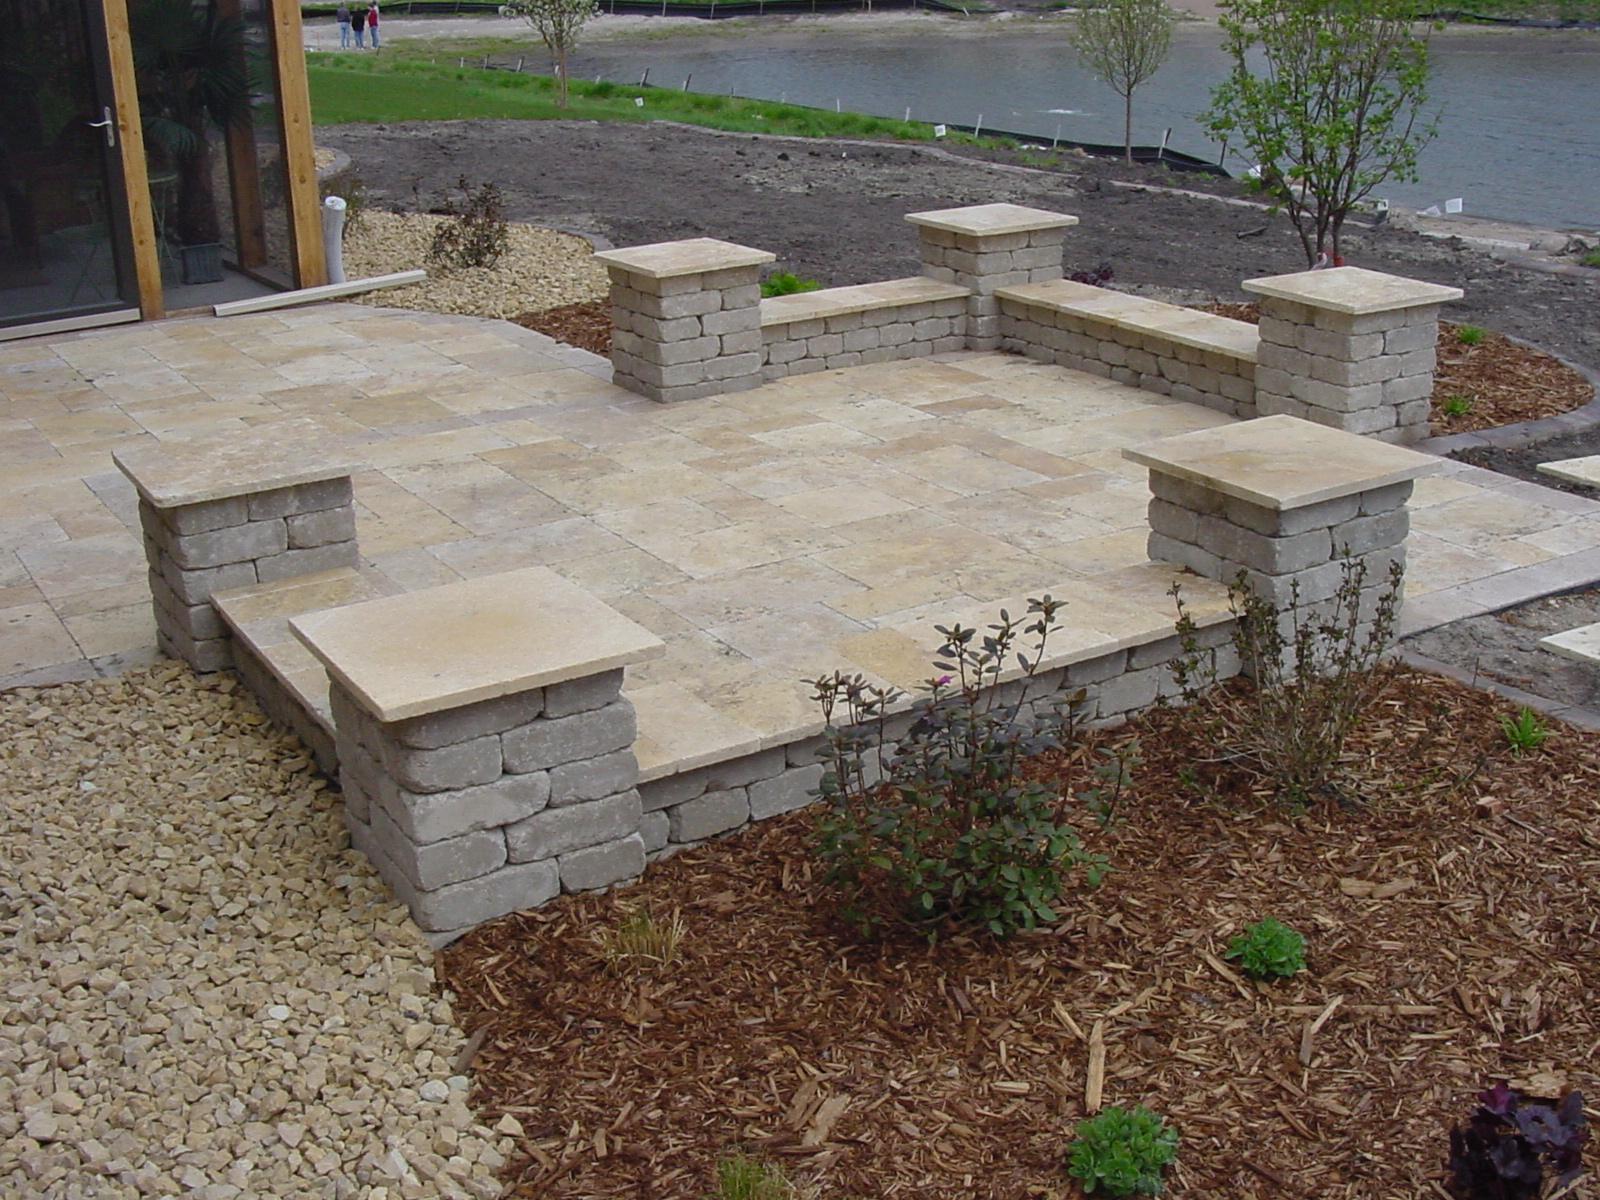 brick and stone patio ideas • patio ideas